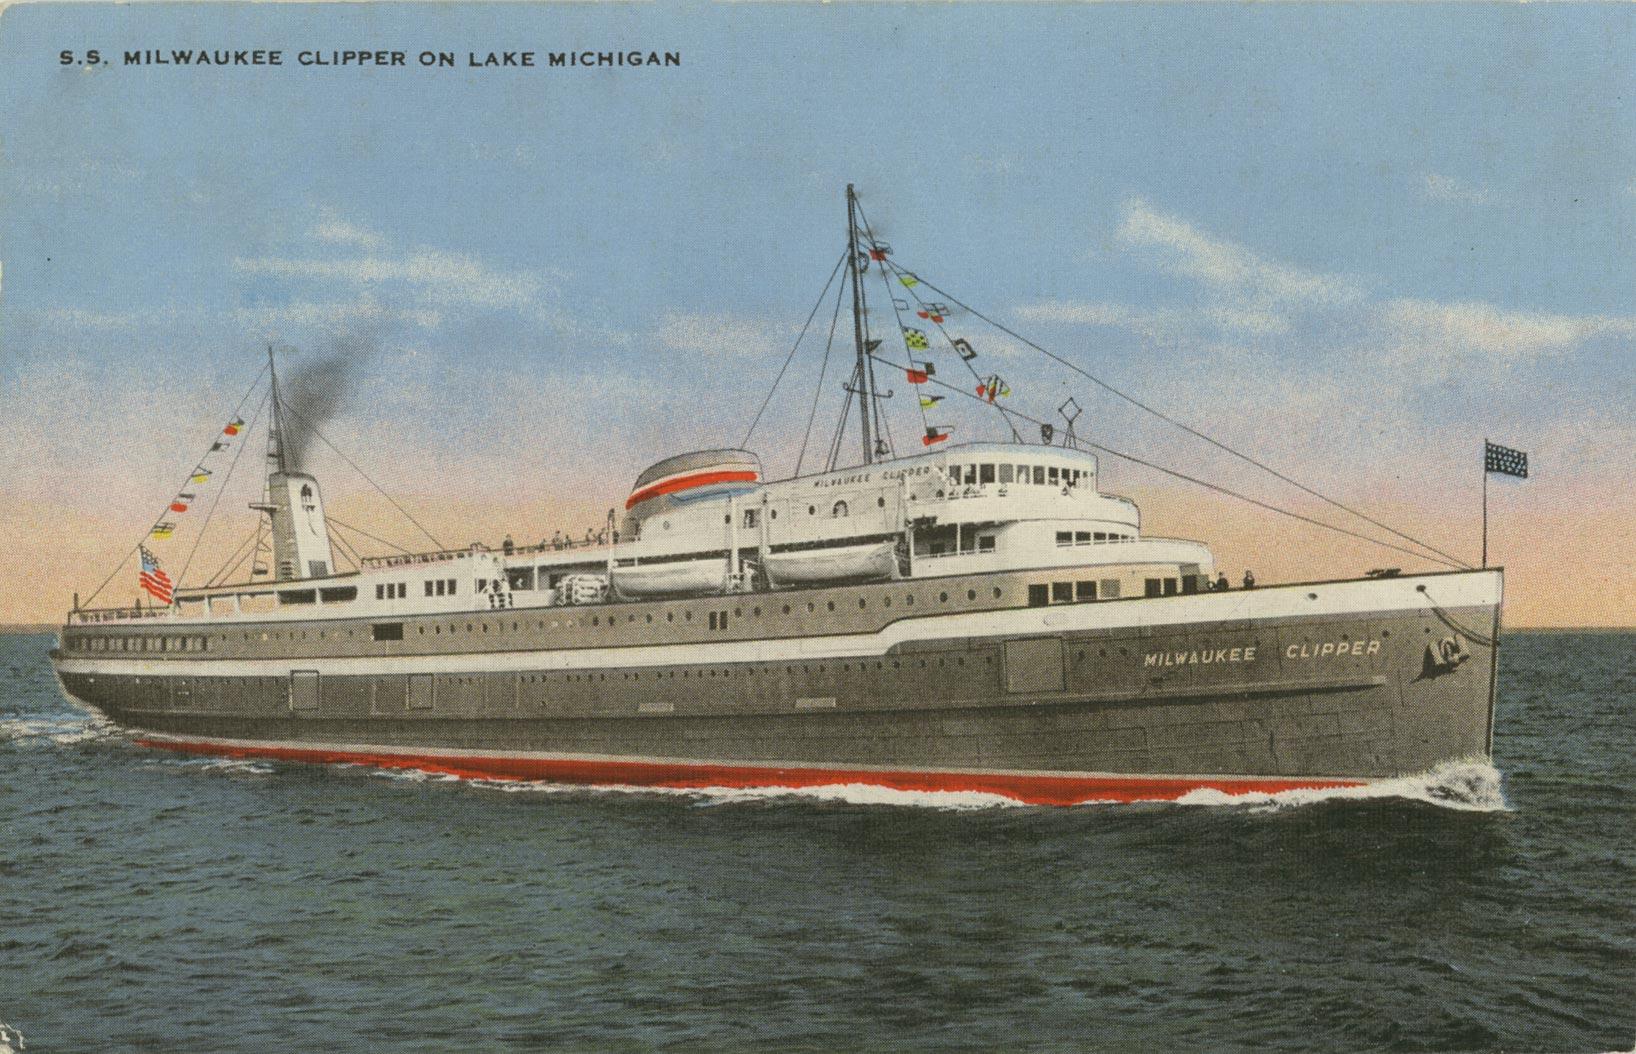 S. S. Milwaukee Clipper on Lake Michigan